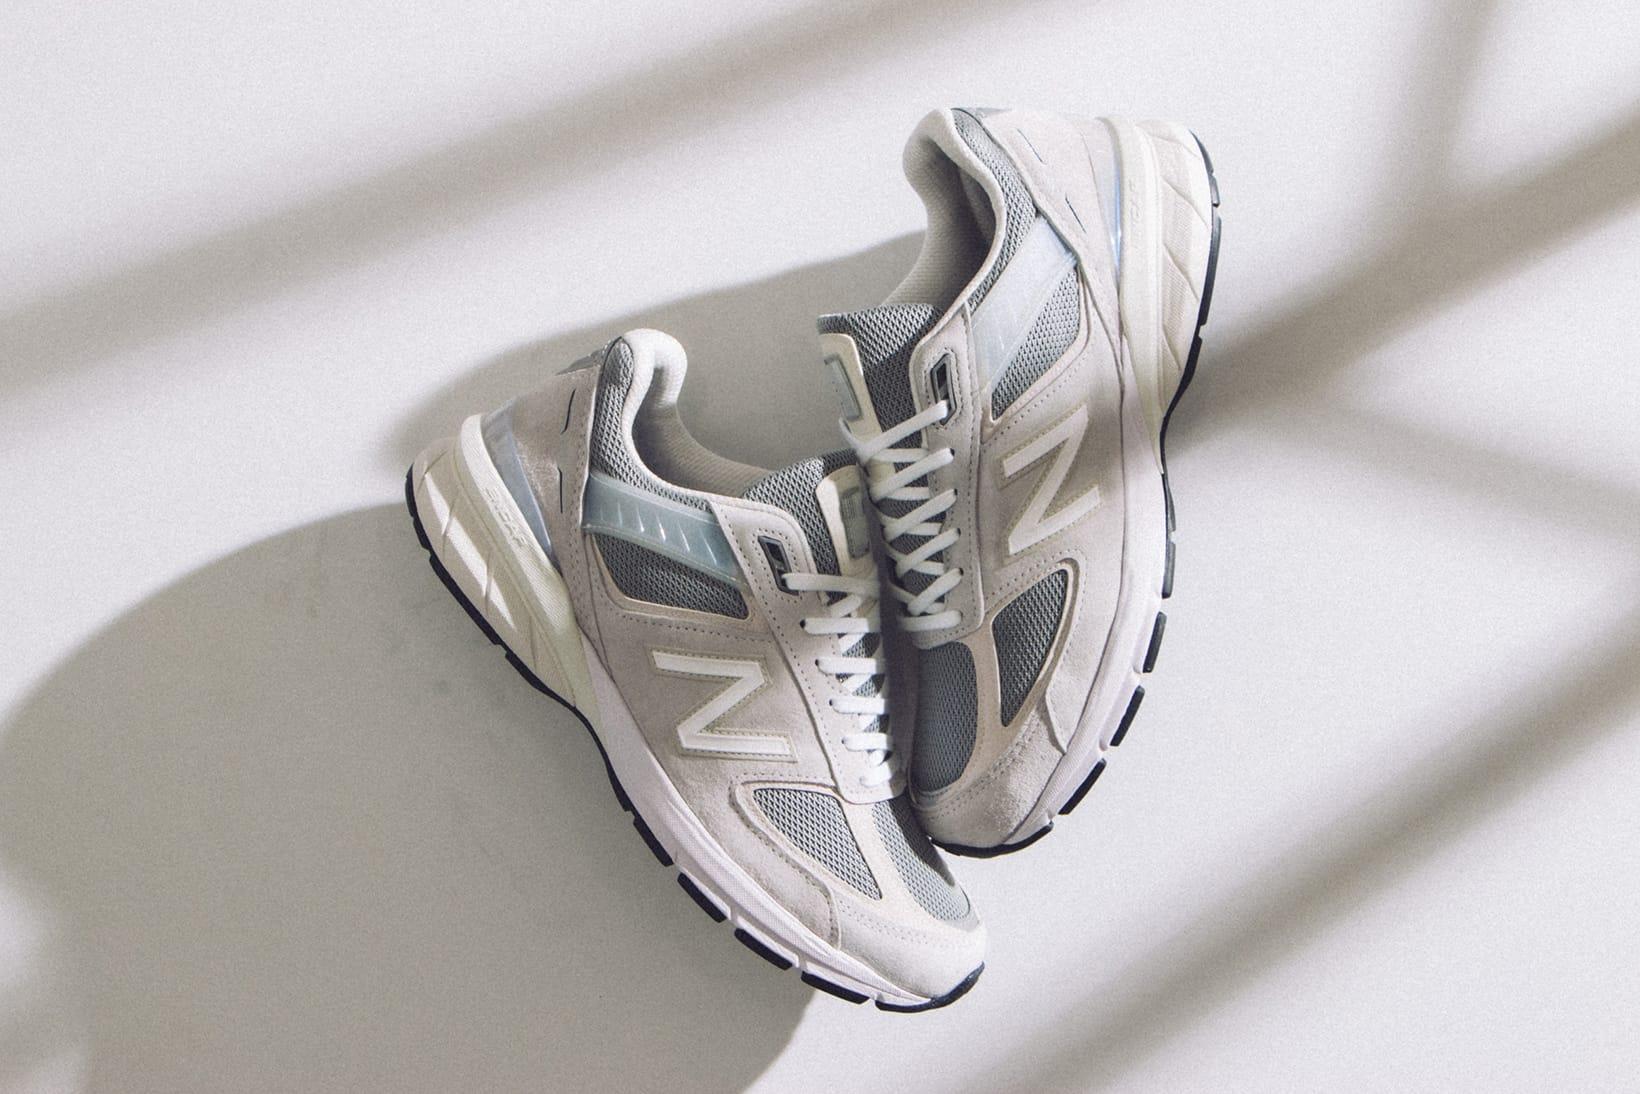 New Balance M990NA5 Sneakers Grey/White